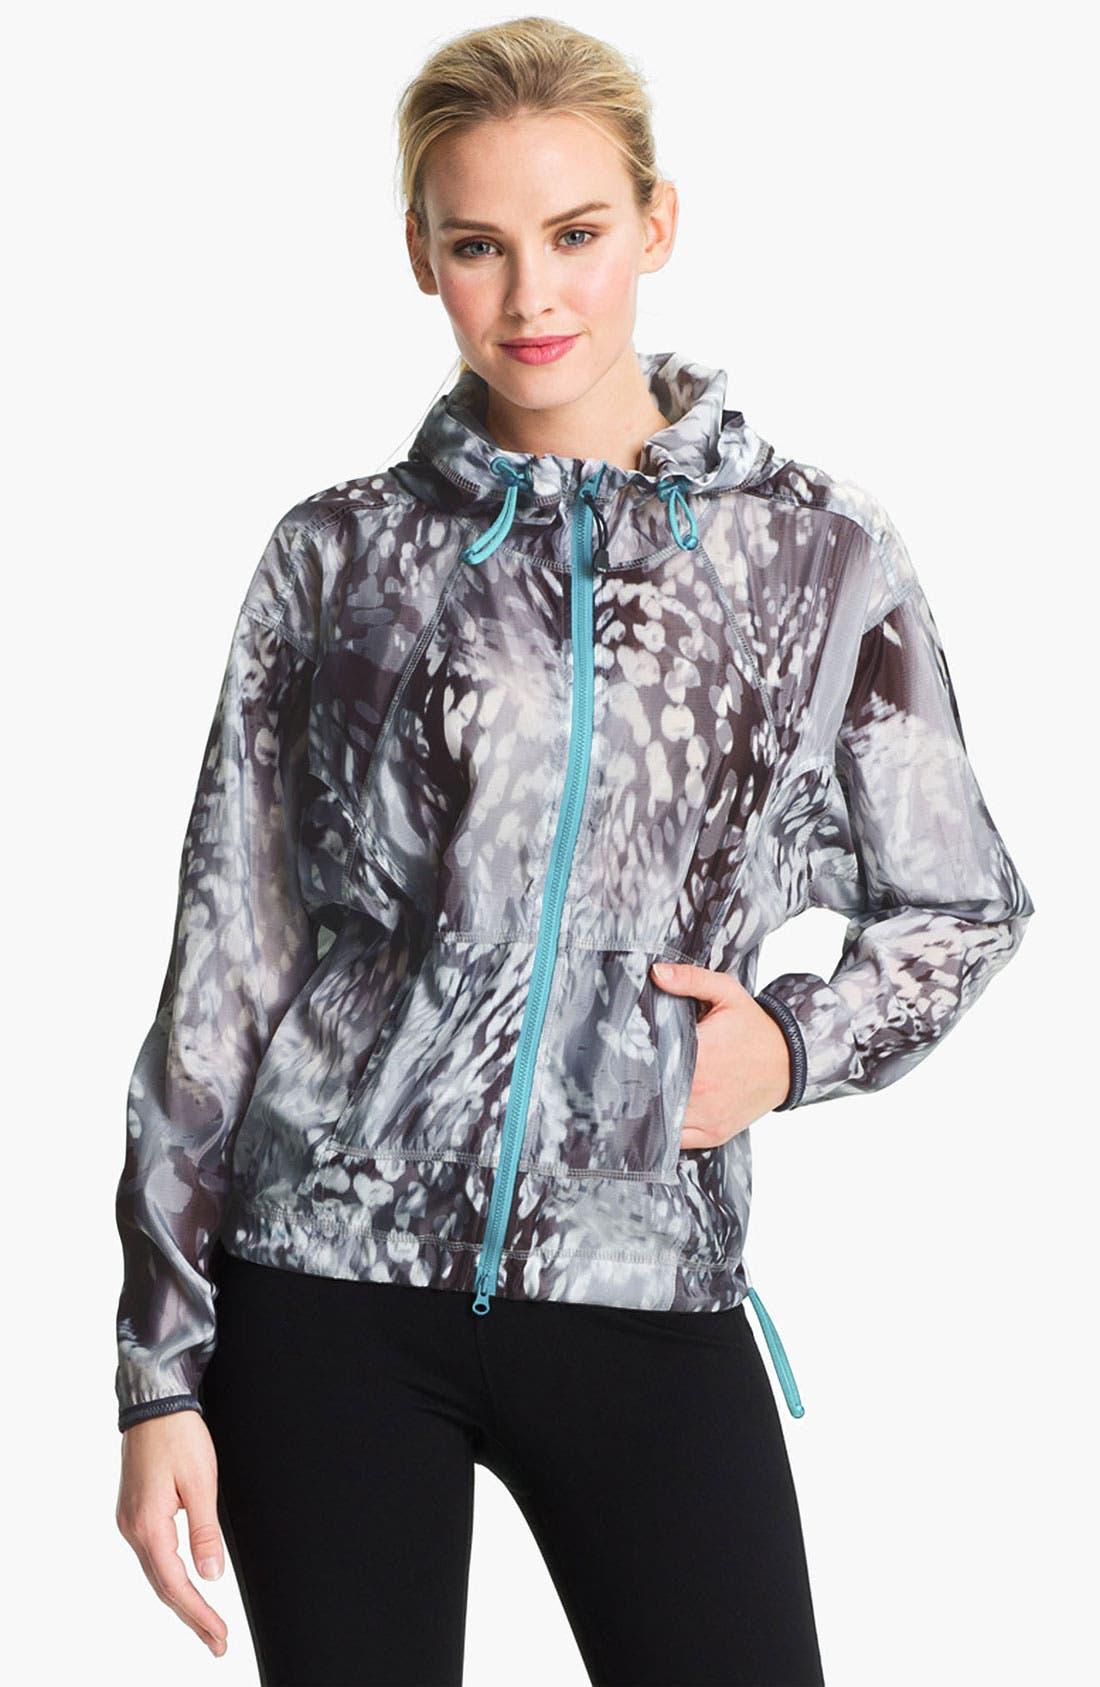 Alternate Image 1 Selected - Zella 'Sprint' Print Jacket